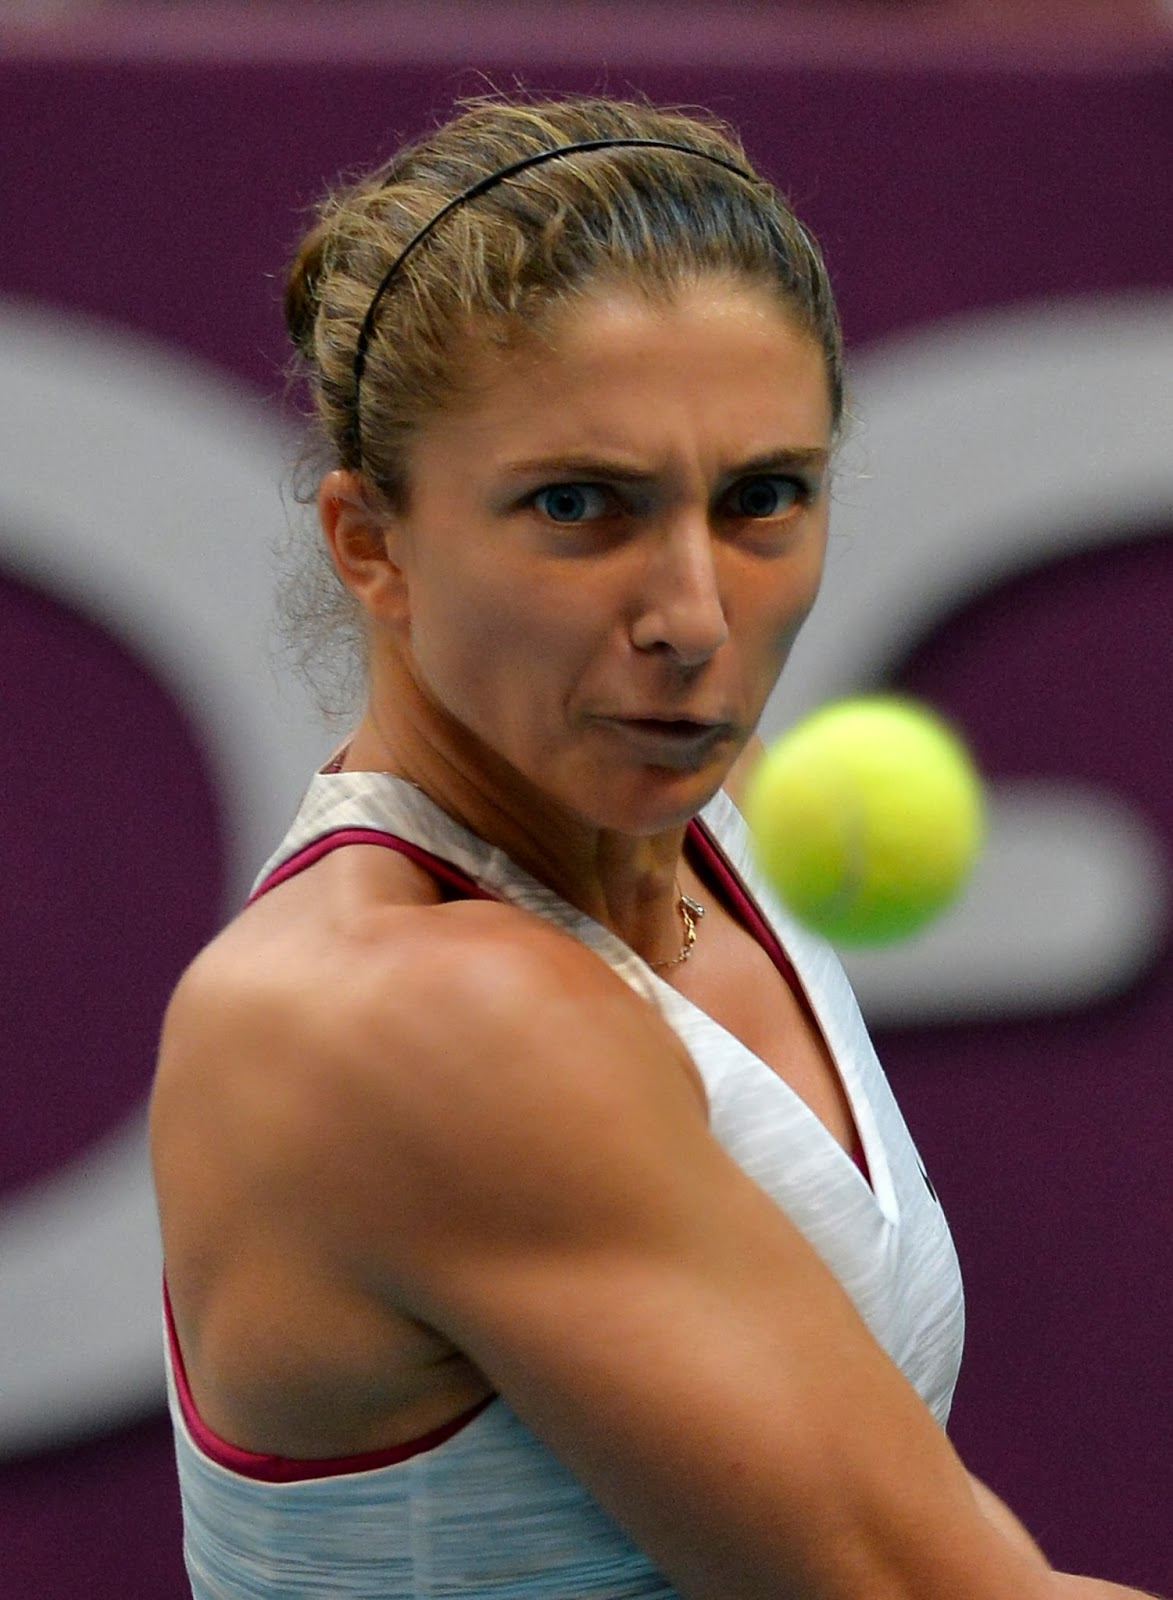 2014, Final, Italy, Match, Paris, Pavlyuchenkova, Russia, Sara Errani, Singles, Tennis, Tournament, Winner, Women, WTA Paris Open,